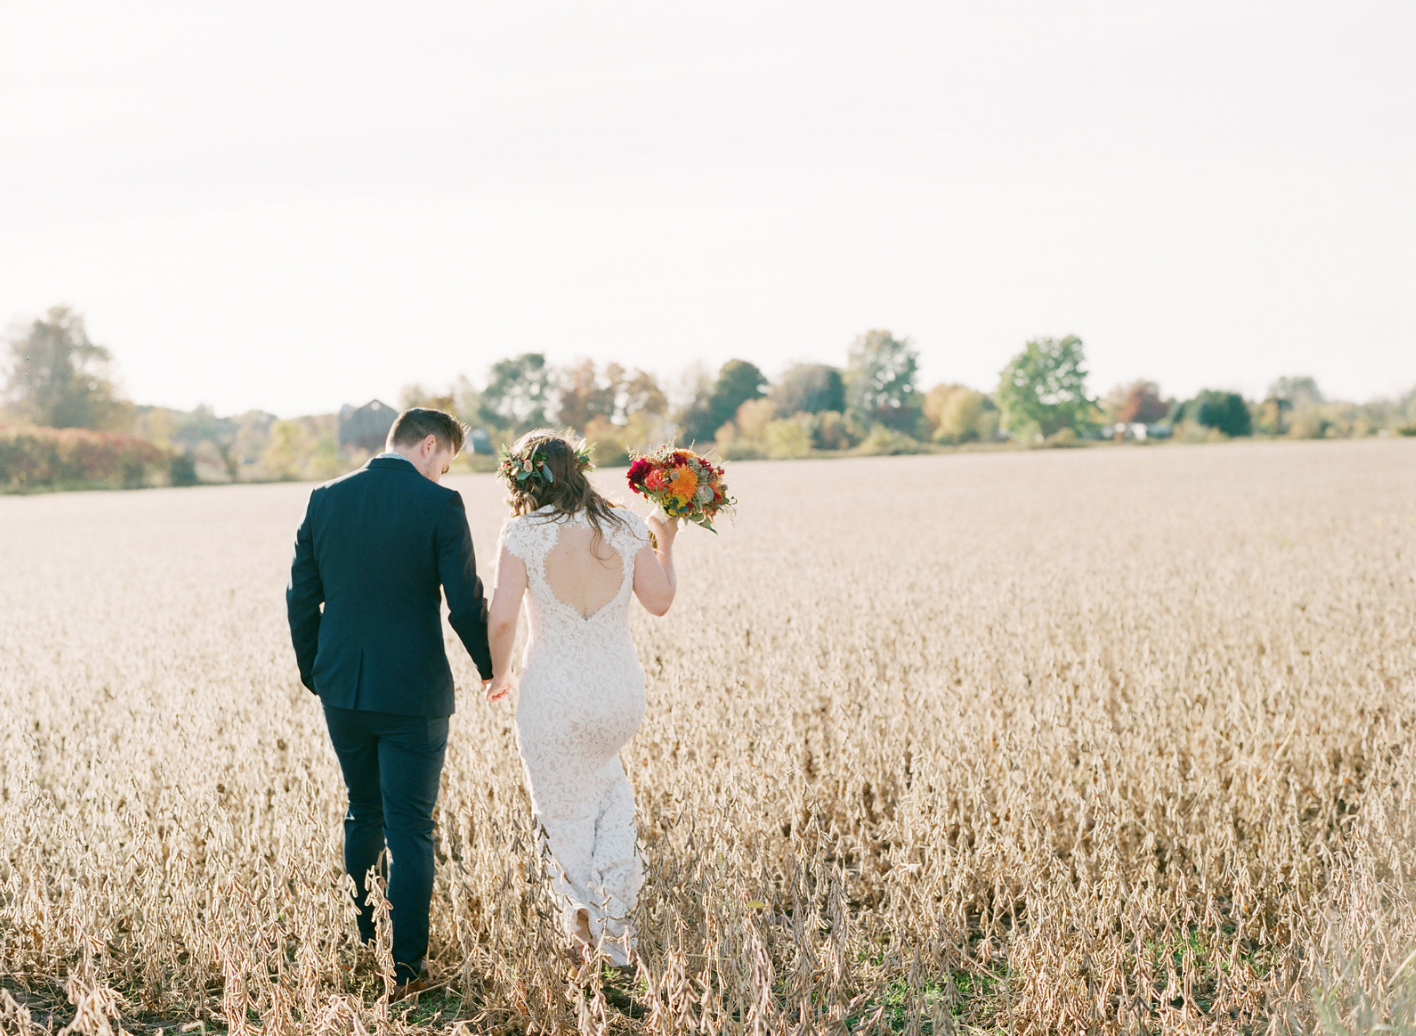 Nunica, MI Beautiful Fall Outdoor Wedding